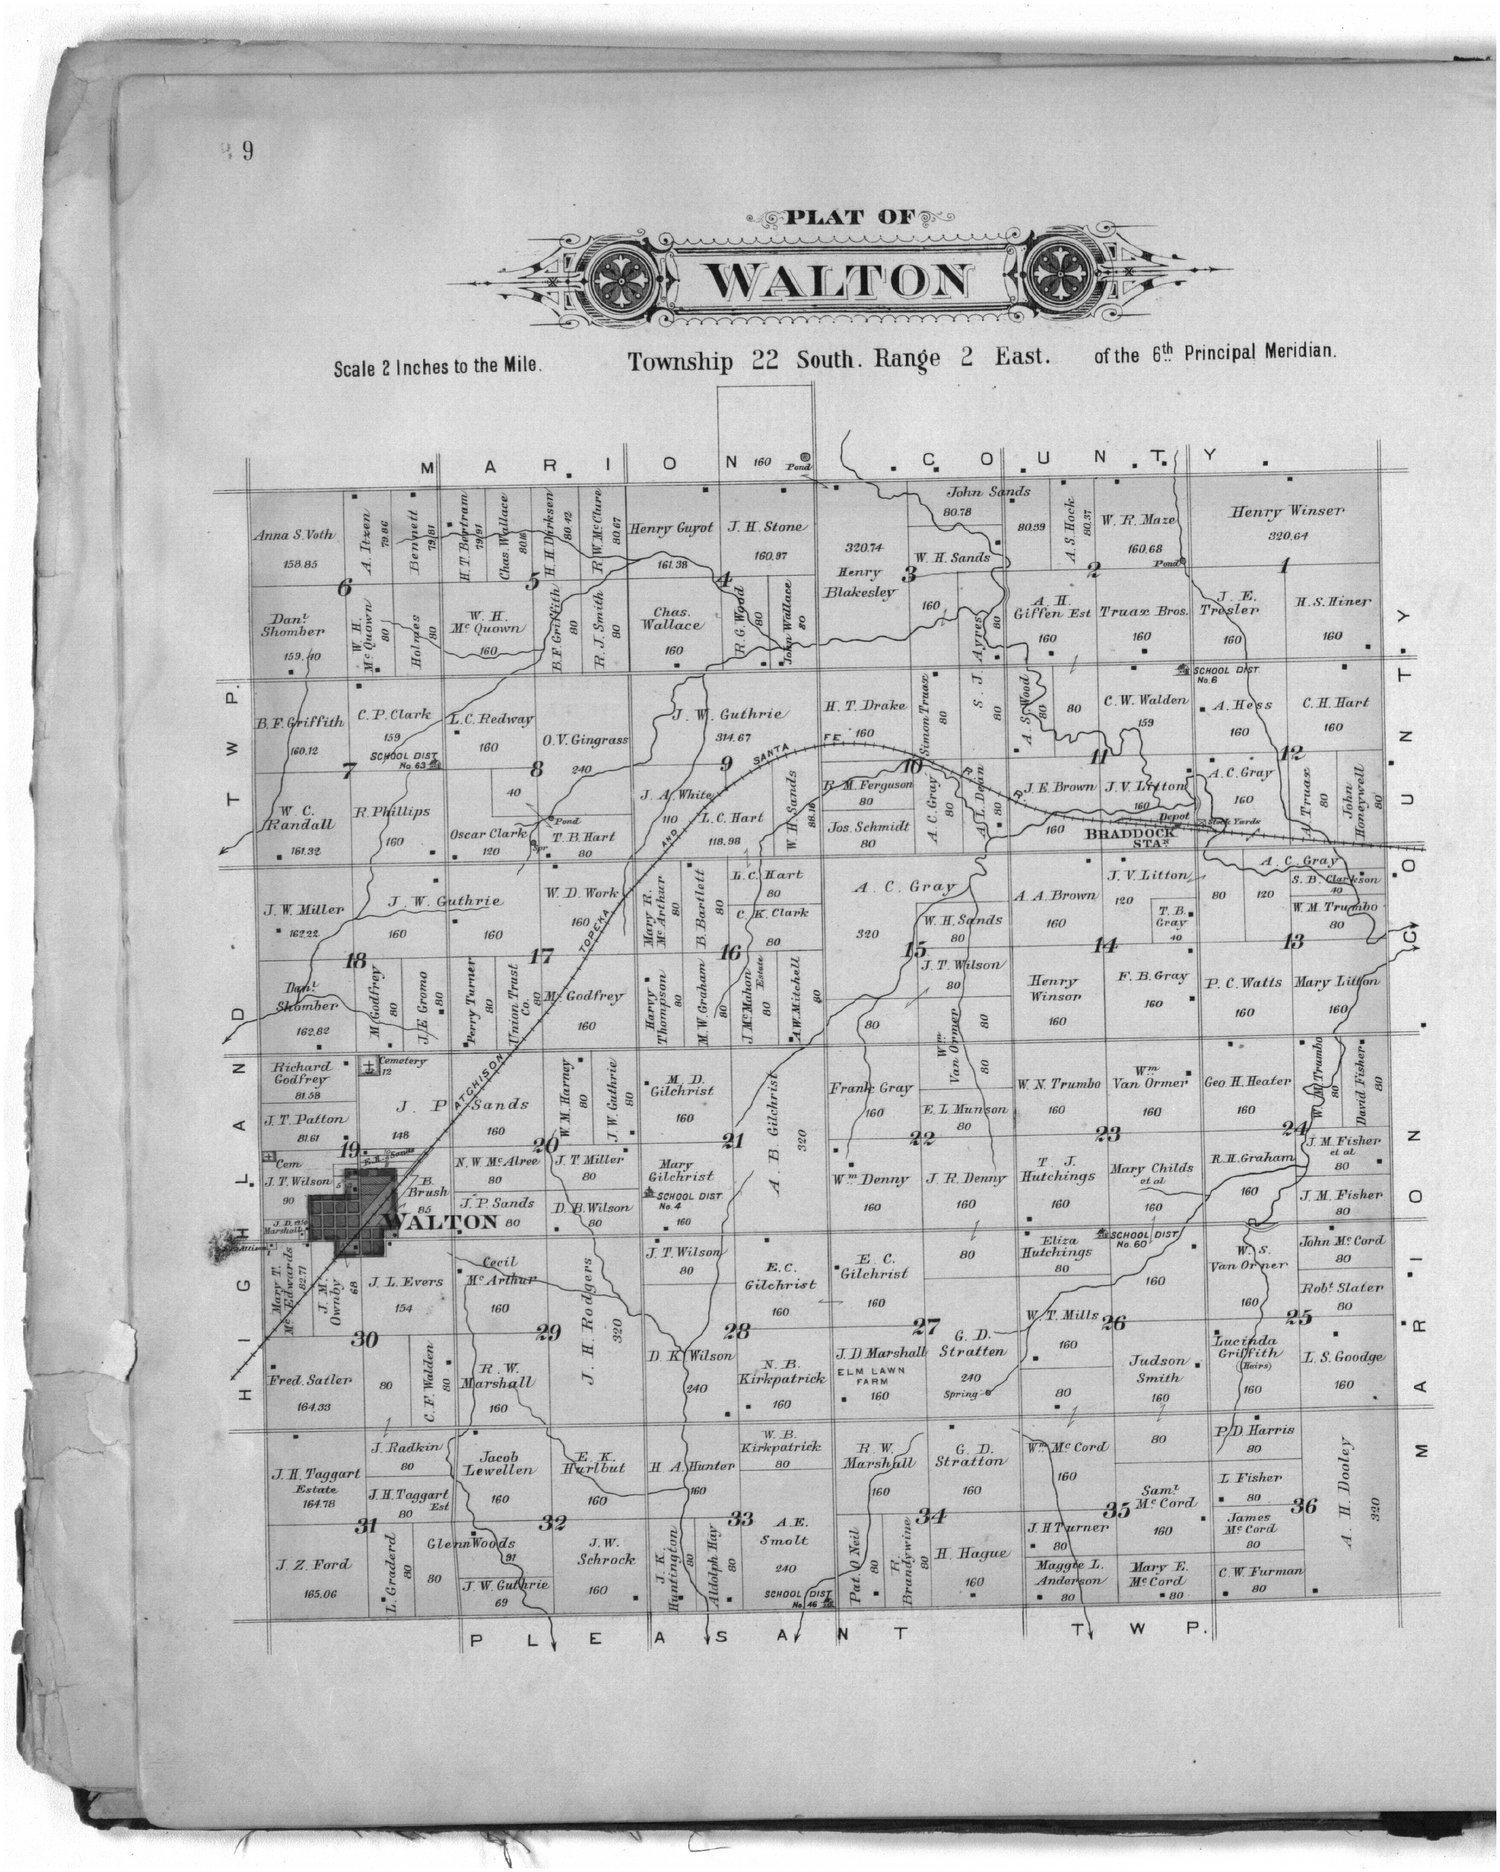 Plat book of Harvey County, Kansas - 9